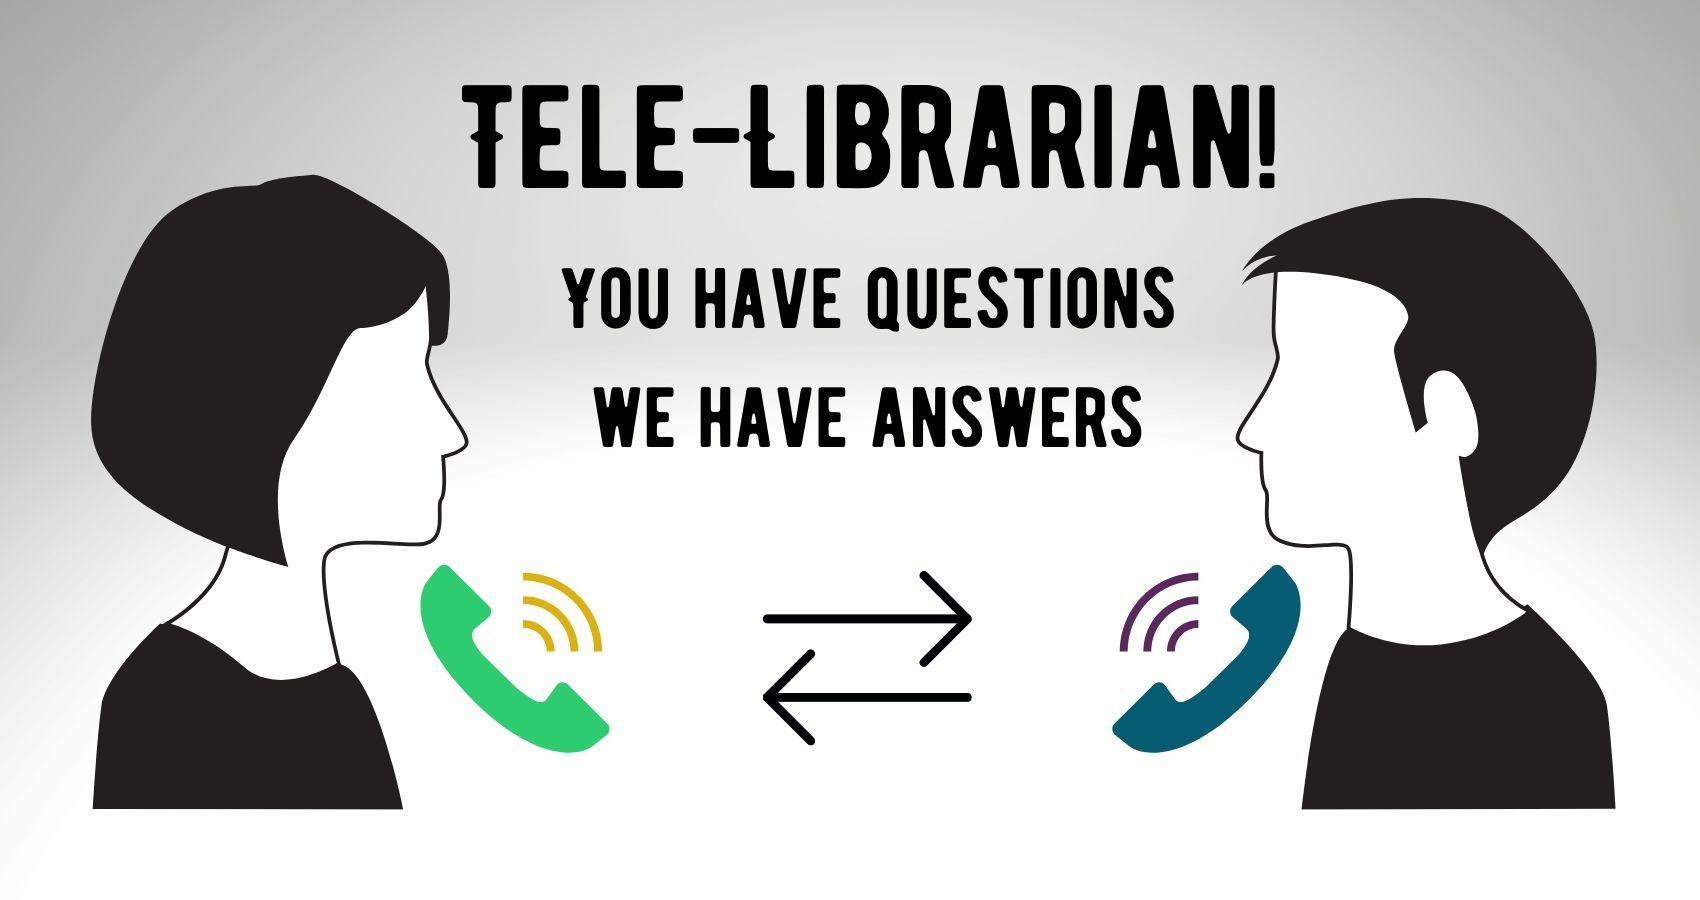 Tele-Librarian